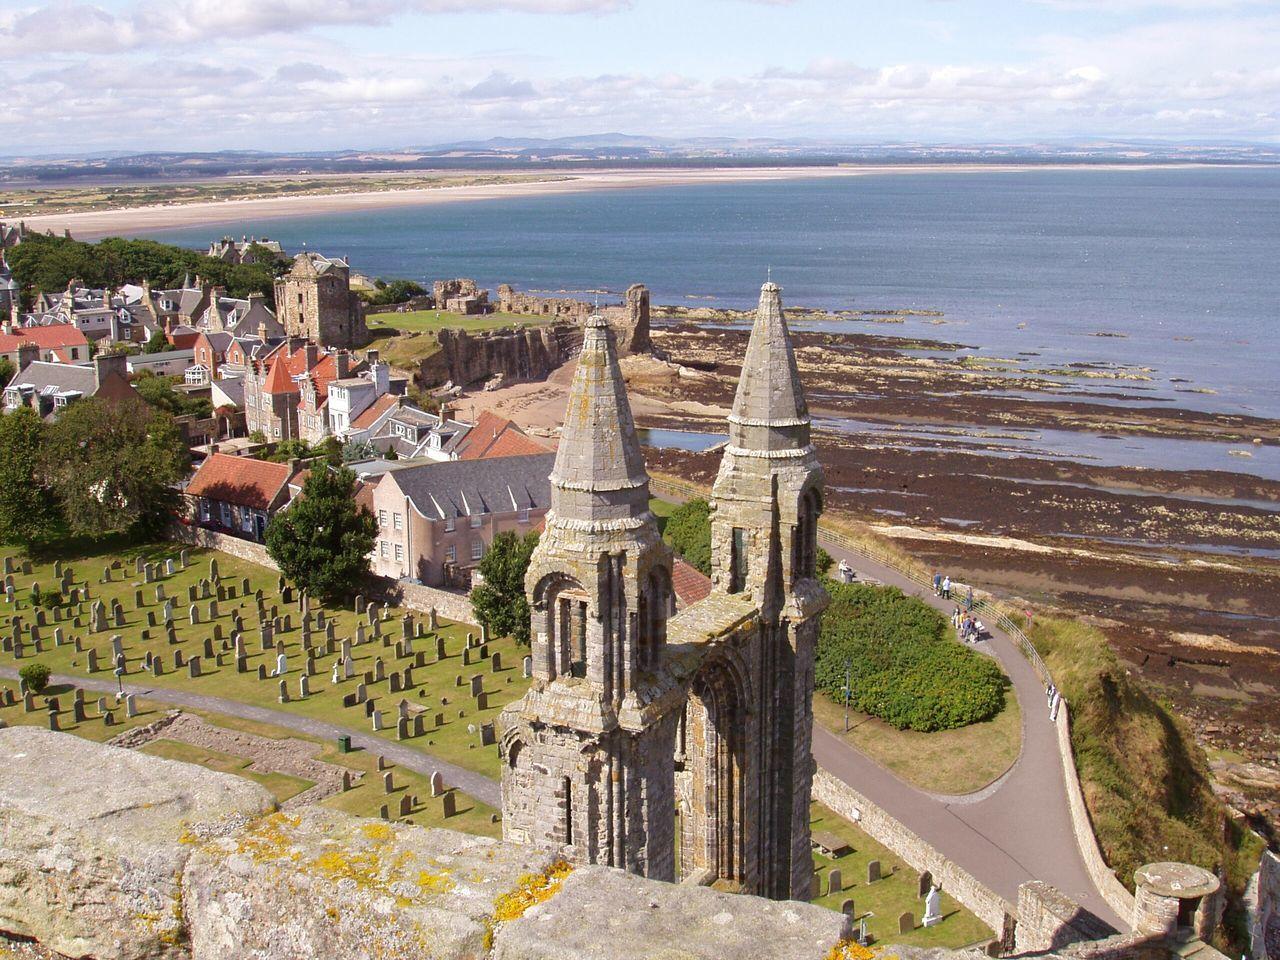 Beautiful stock photos of scotland, architecture, sea, outdoors, no people